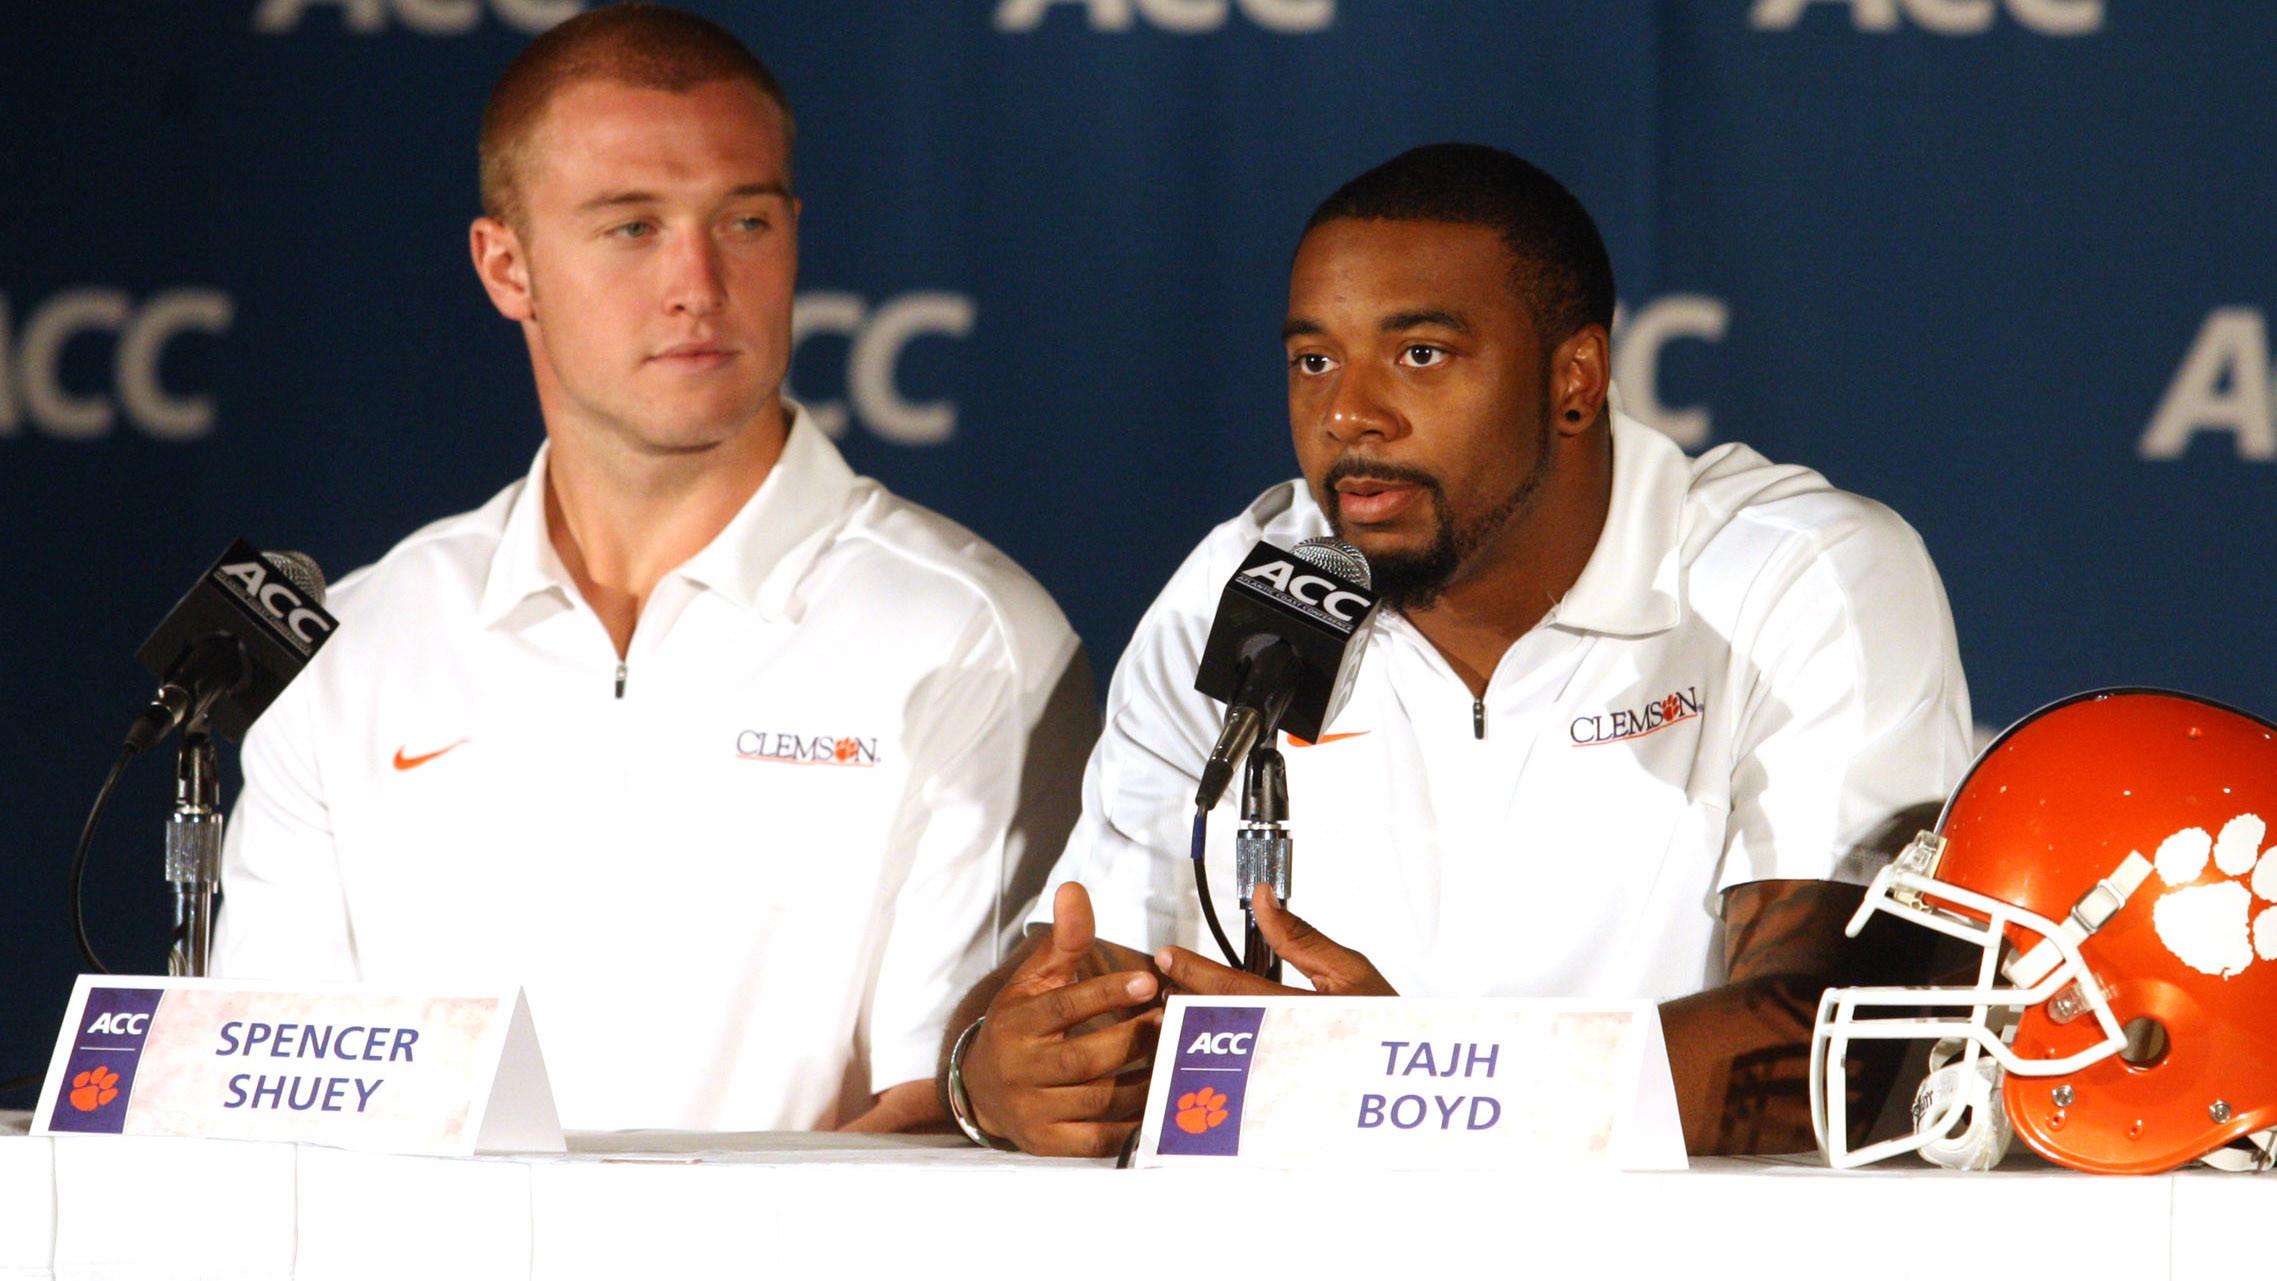 EXCLUSIVE: Boyd: Tigers Focused on Performance, Not Preseason Hype